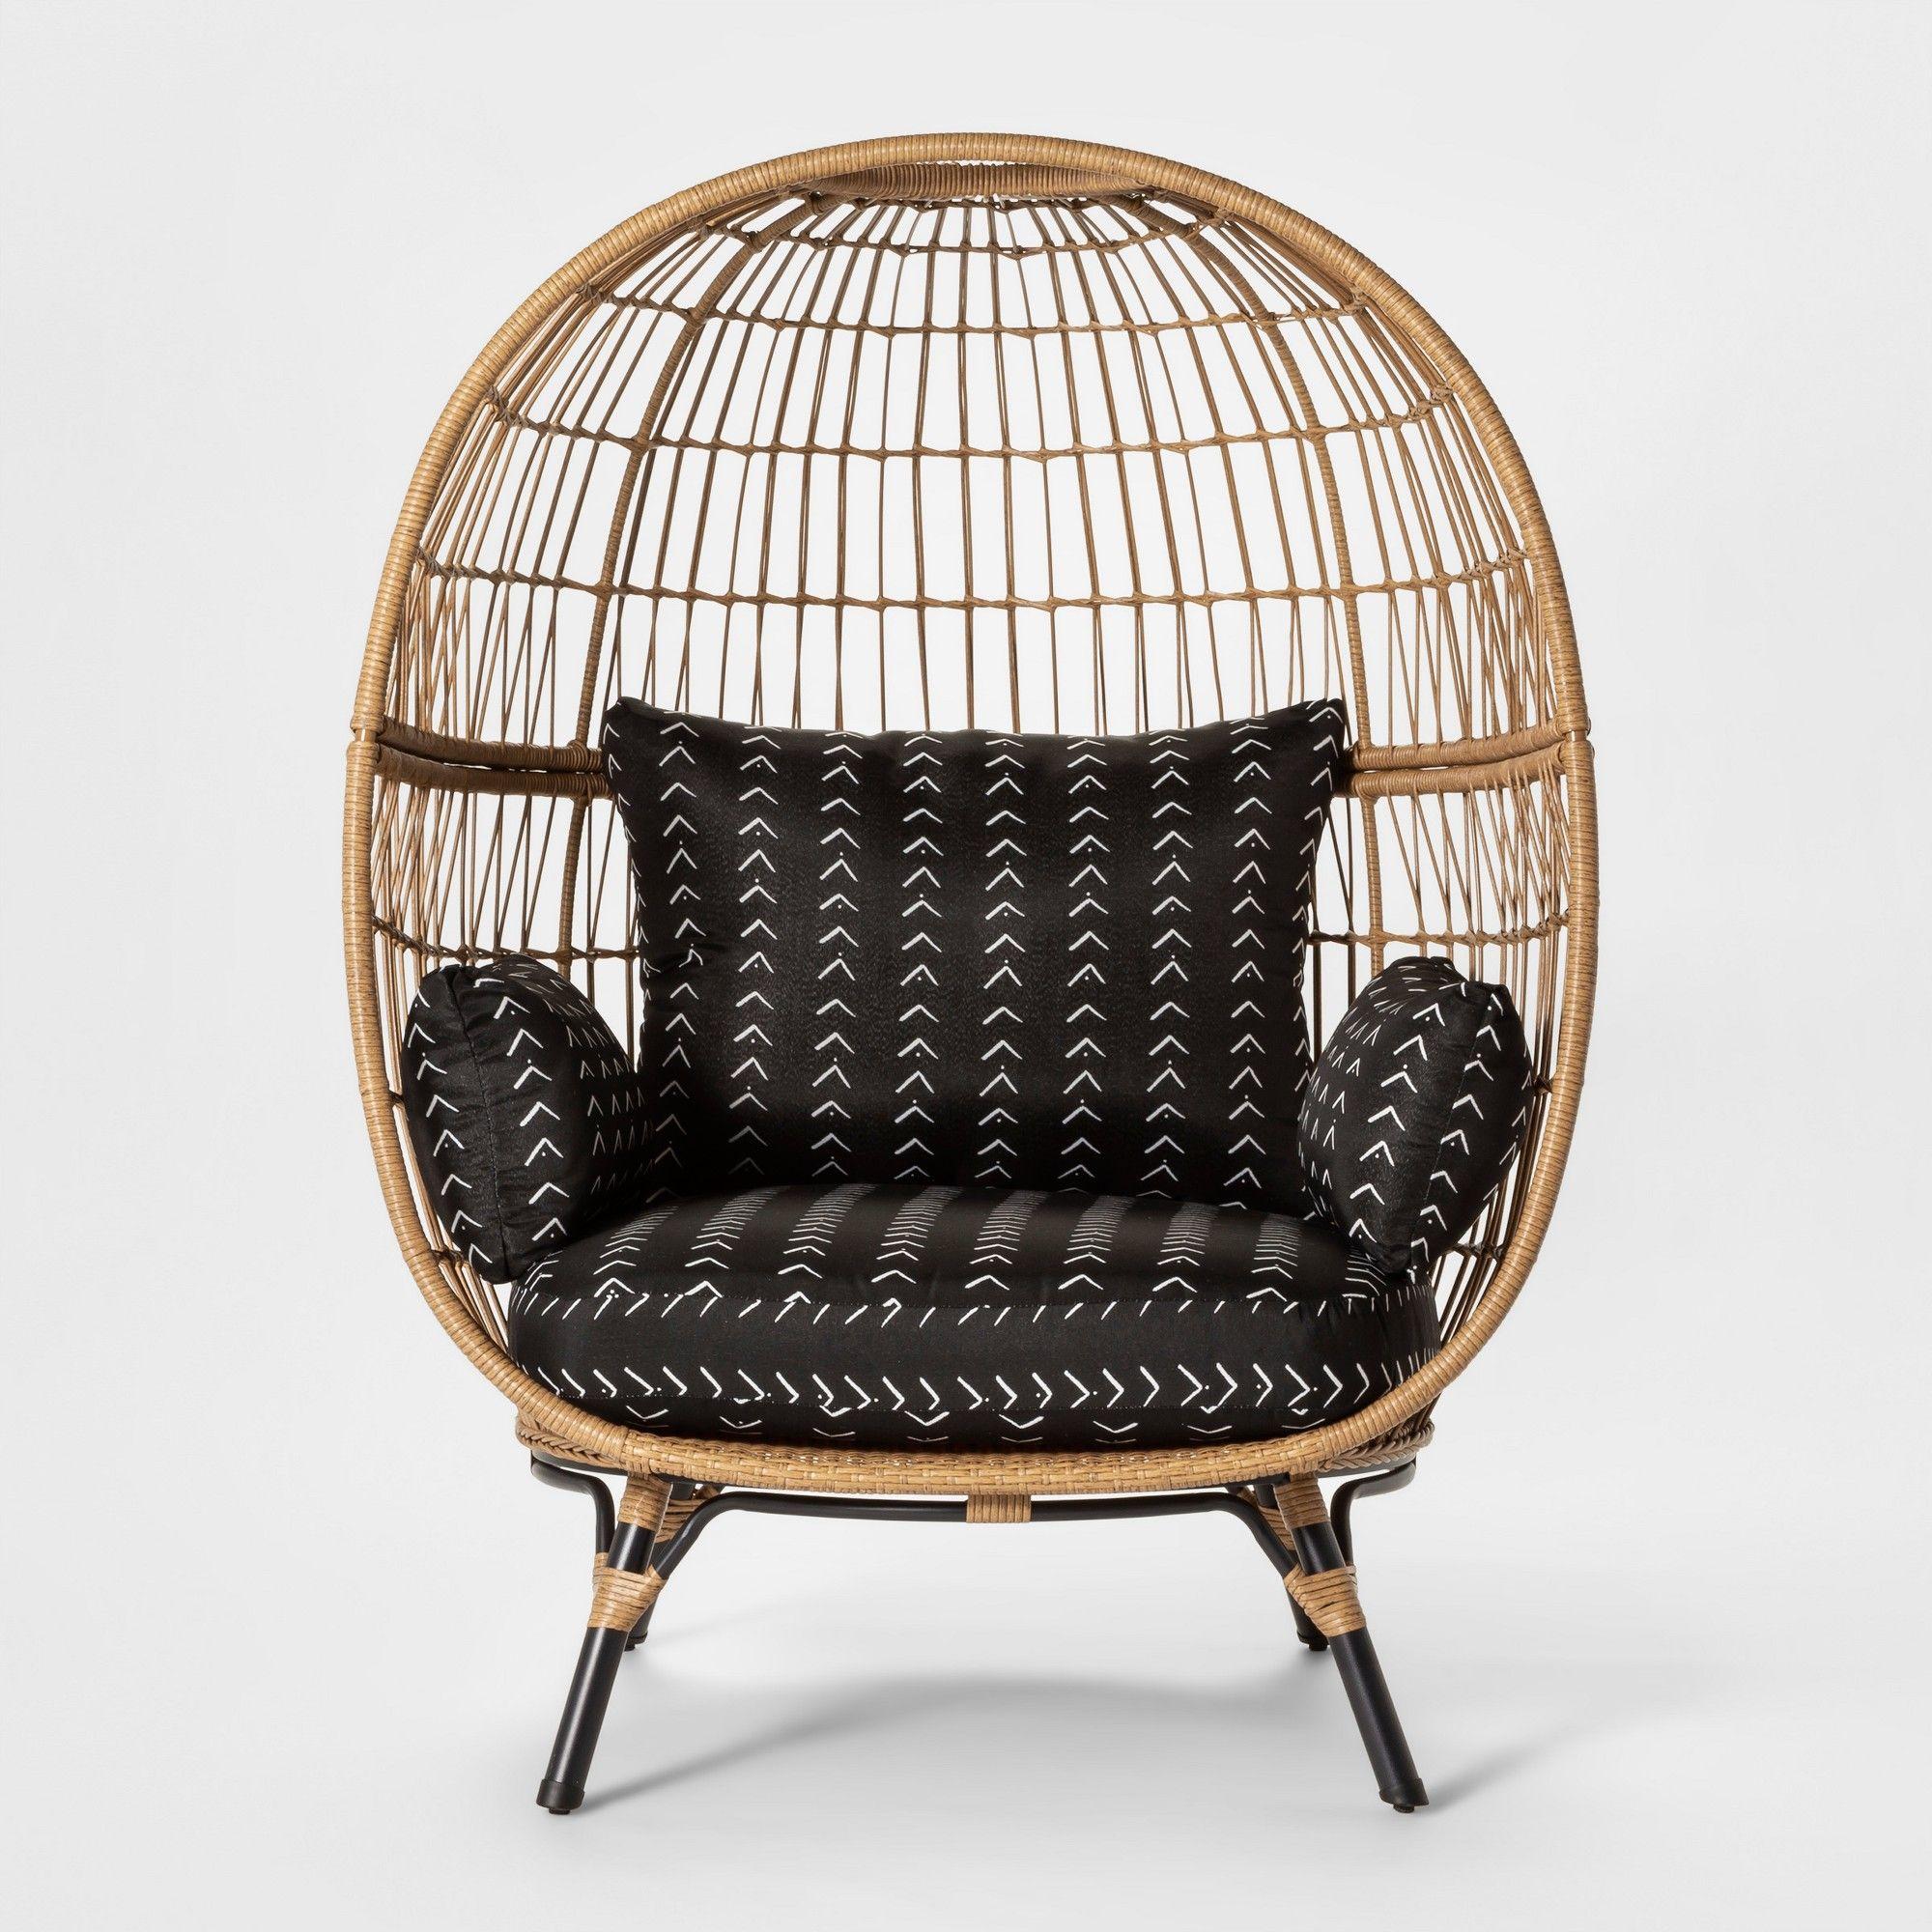 Southport Vee Stripe Patio Egg Chair Black/White